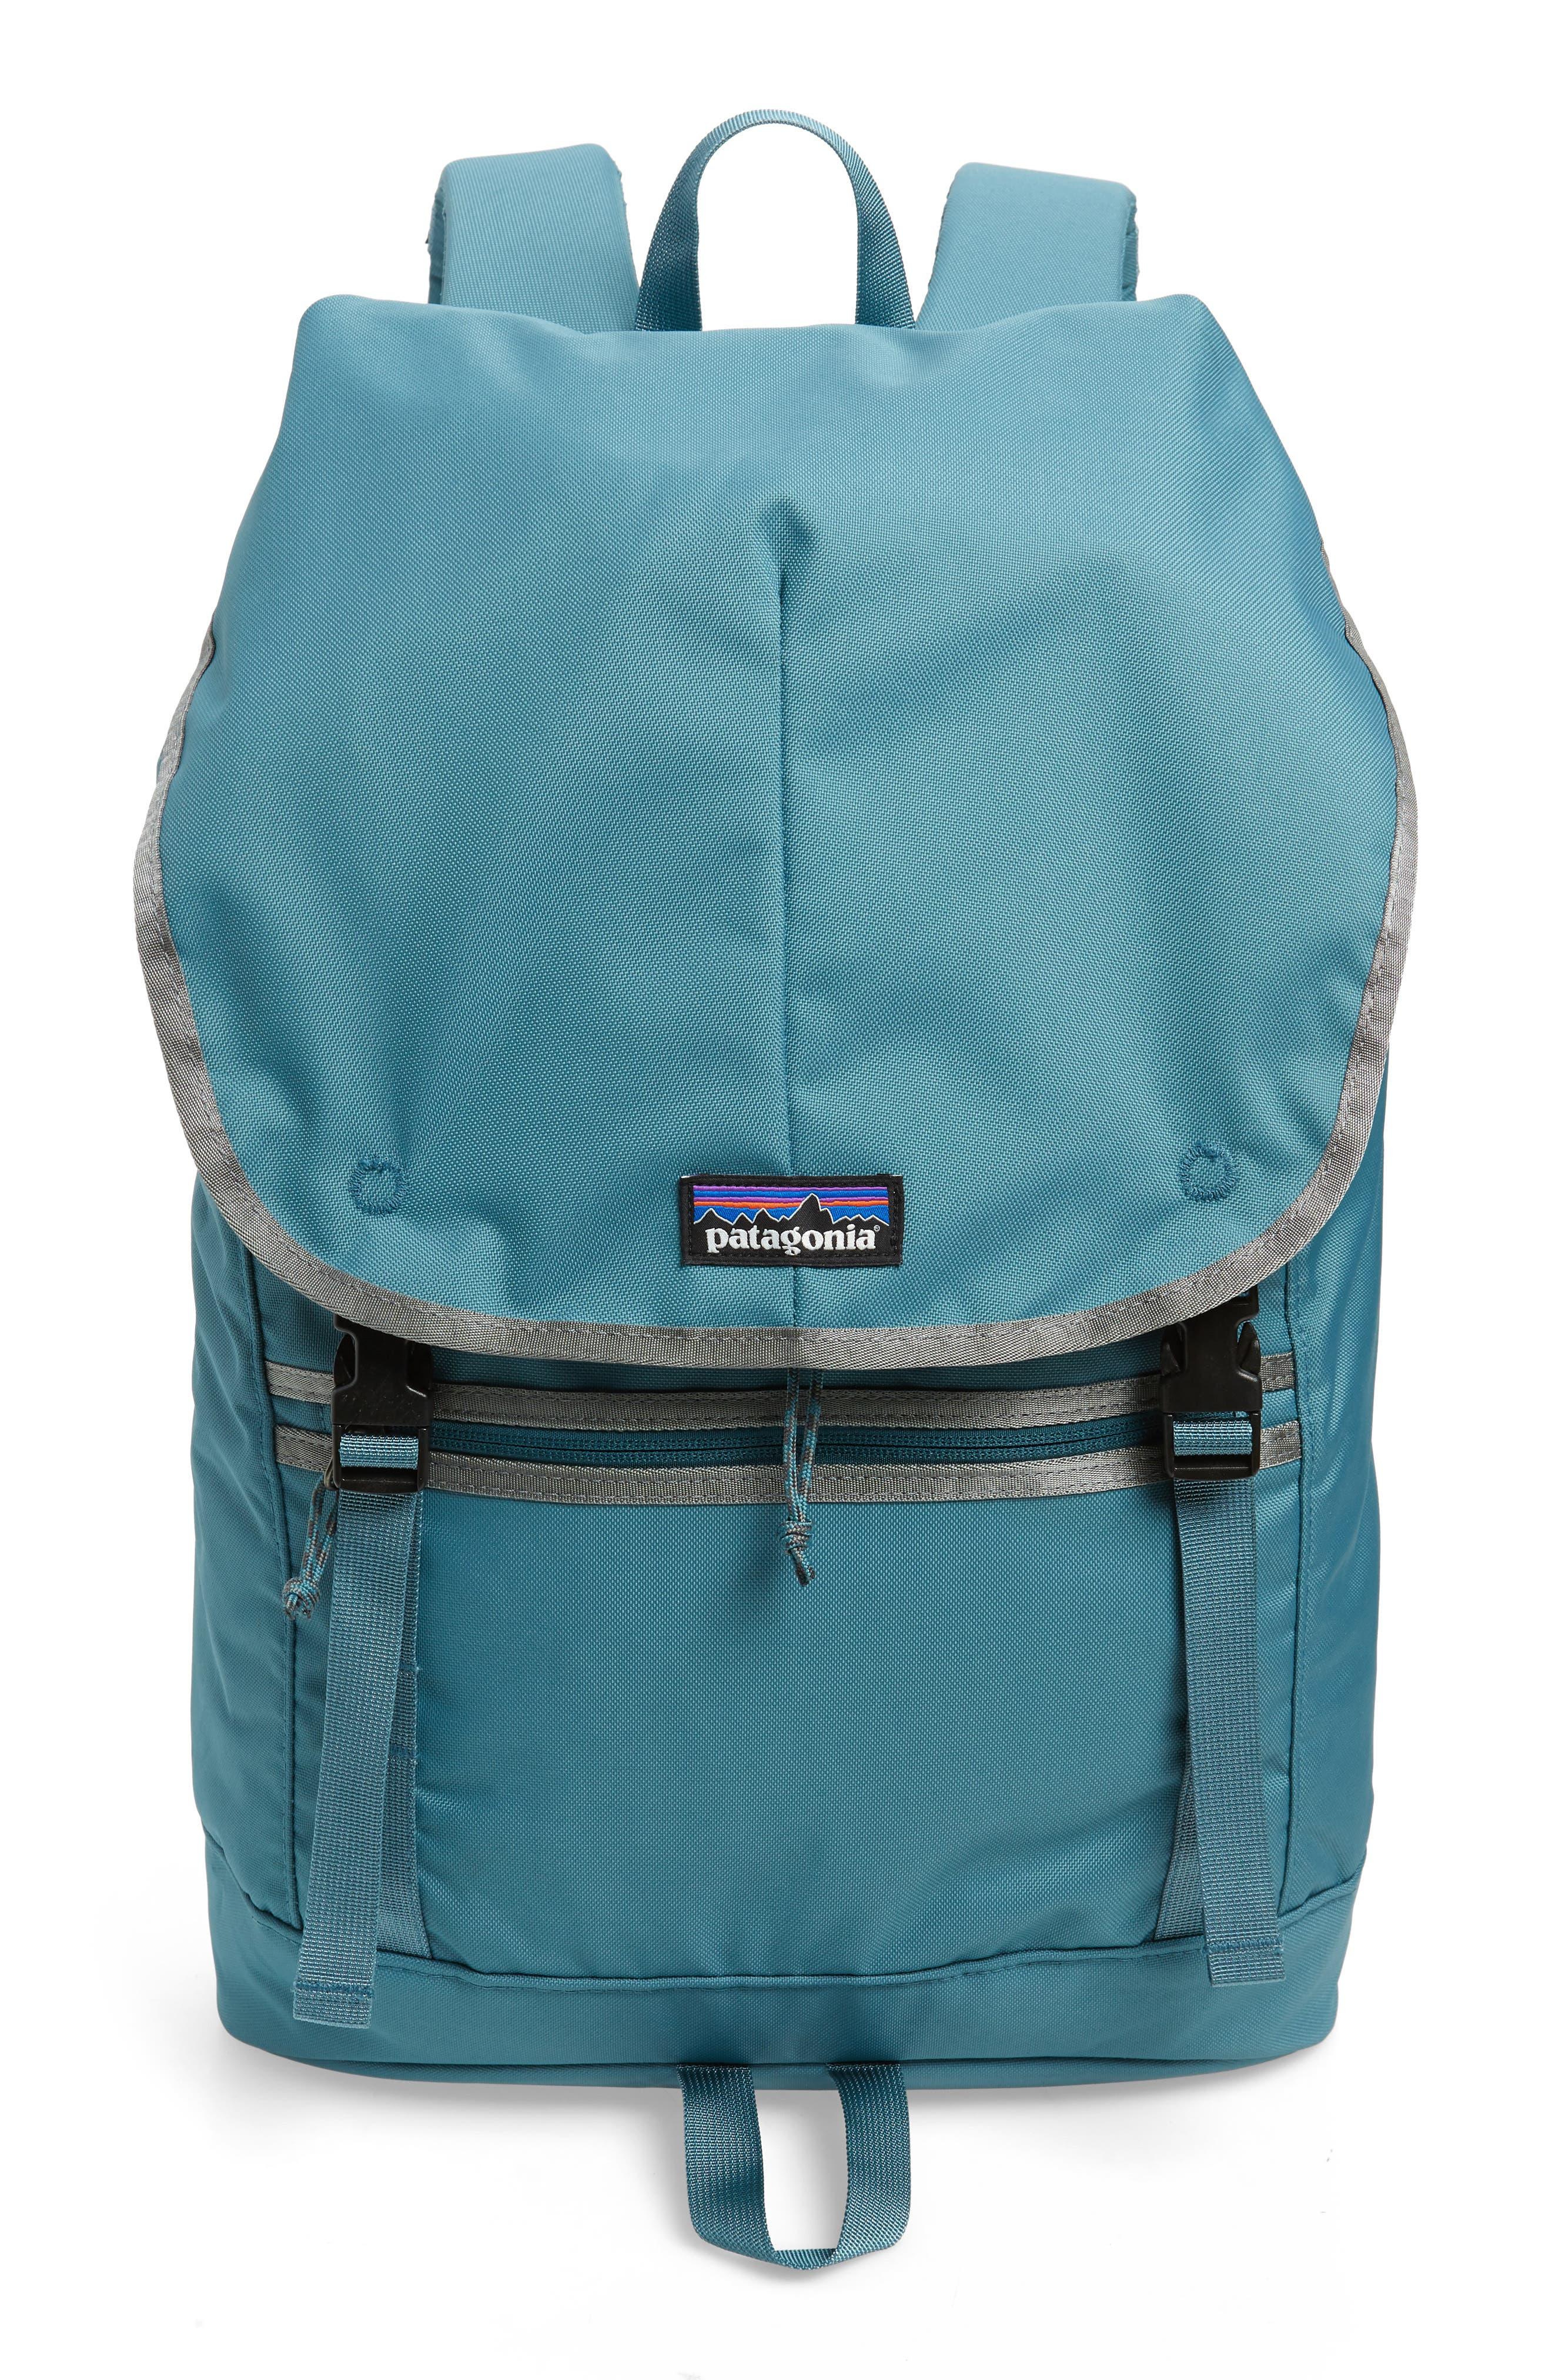 Patagonia Arbor Classic Backpack - Blue